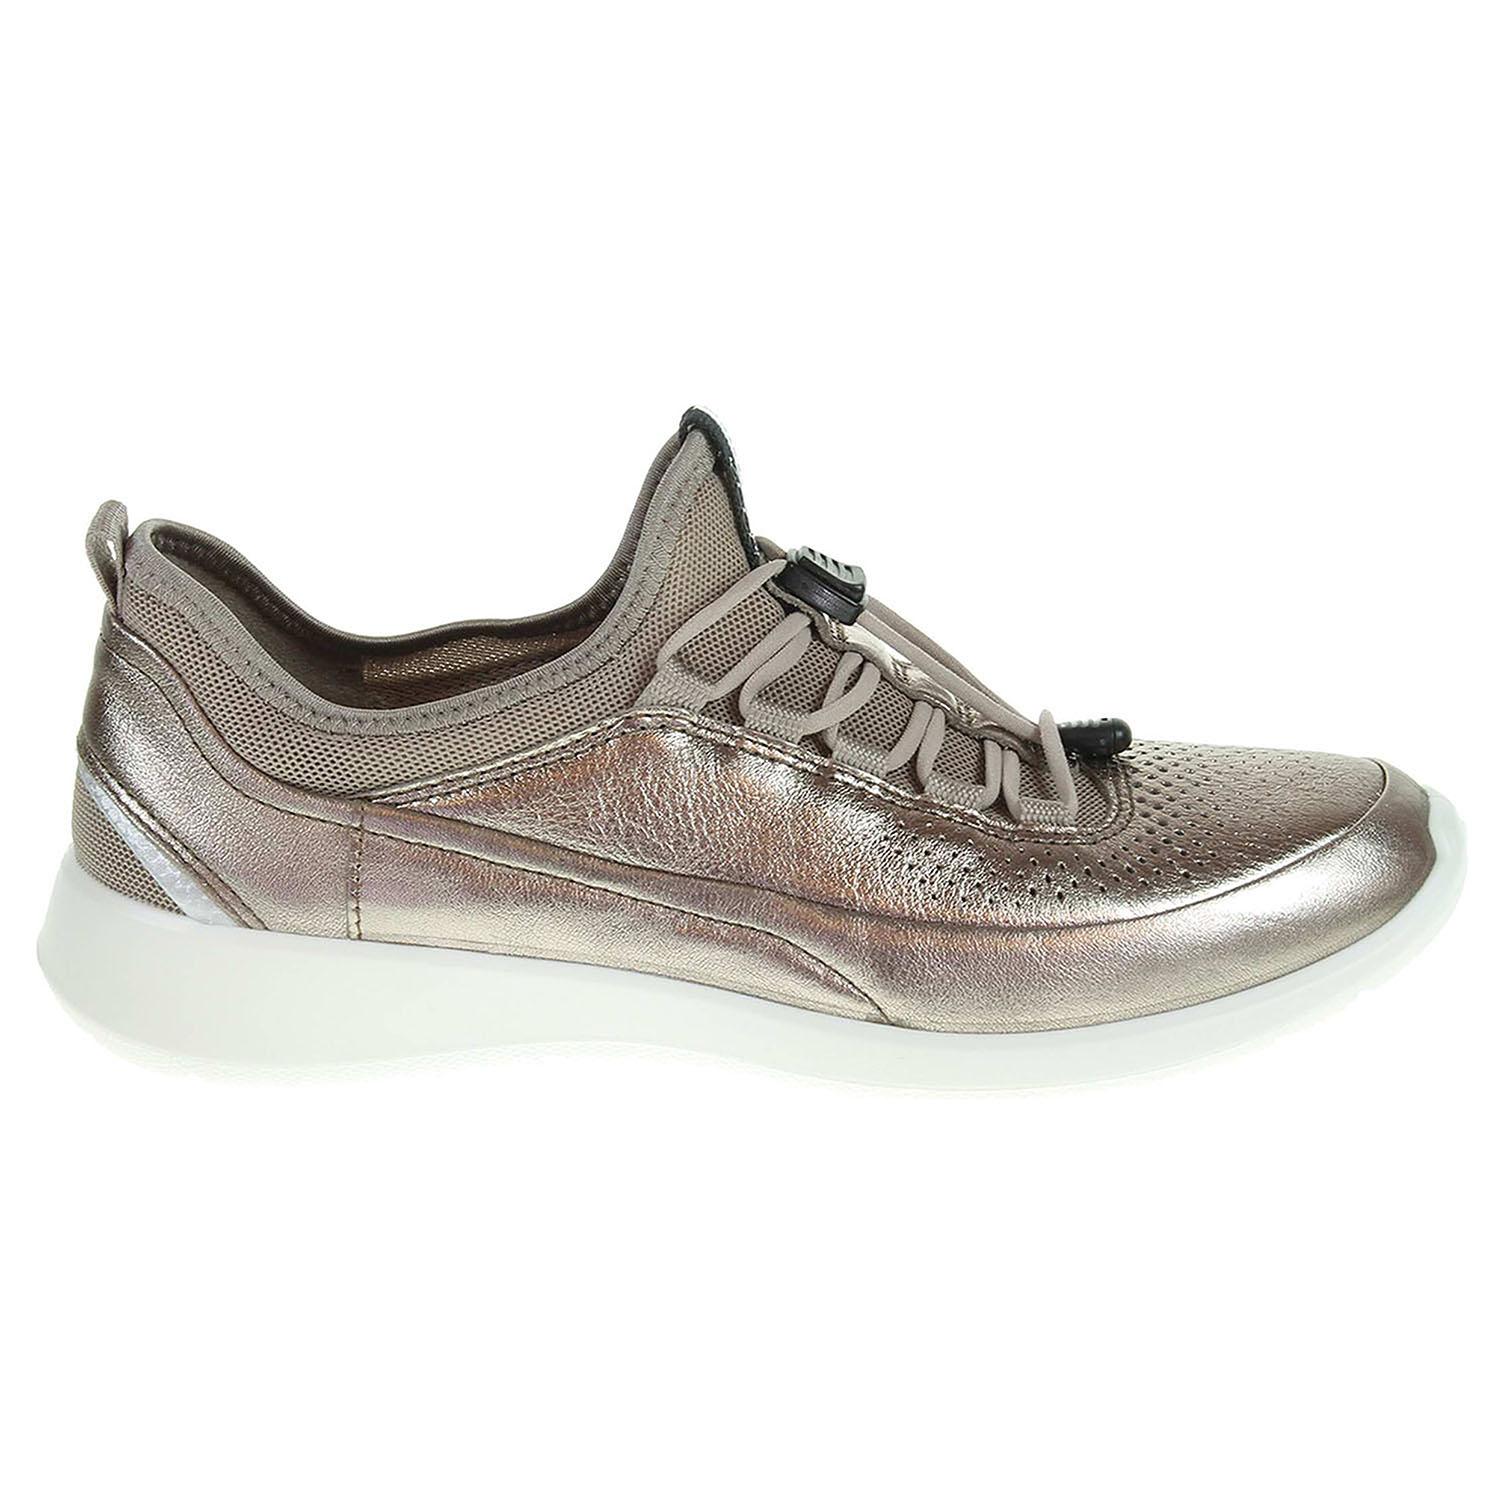 Ecco Soft 5 dámská obuv 28301357462 zlatá 41